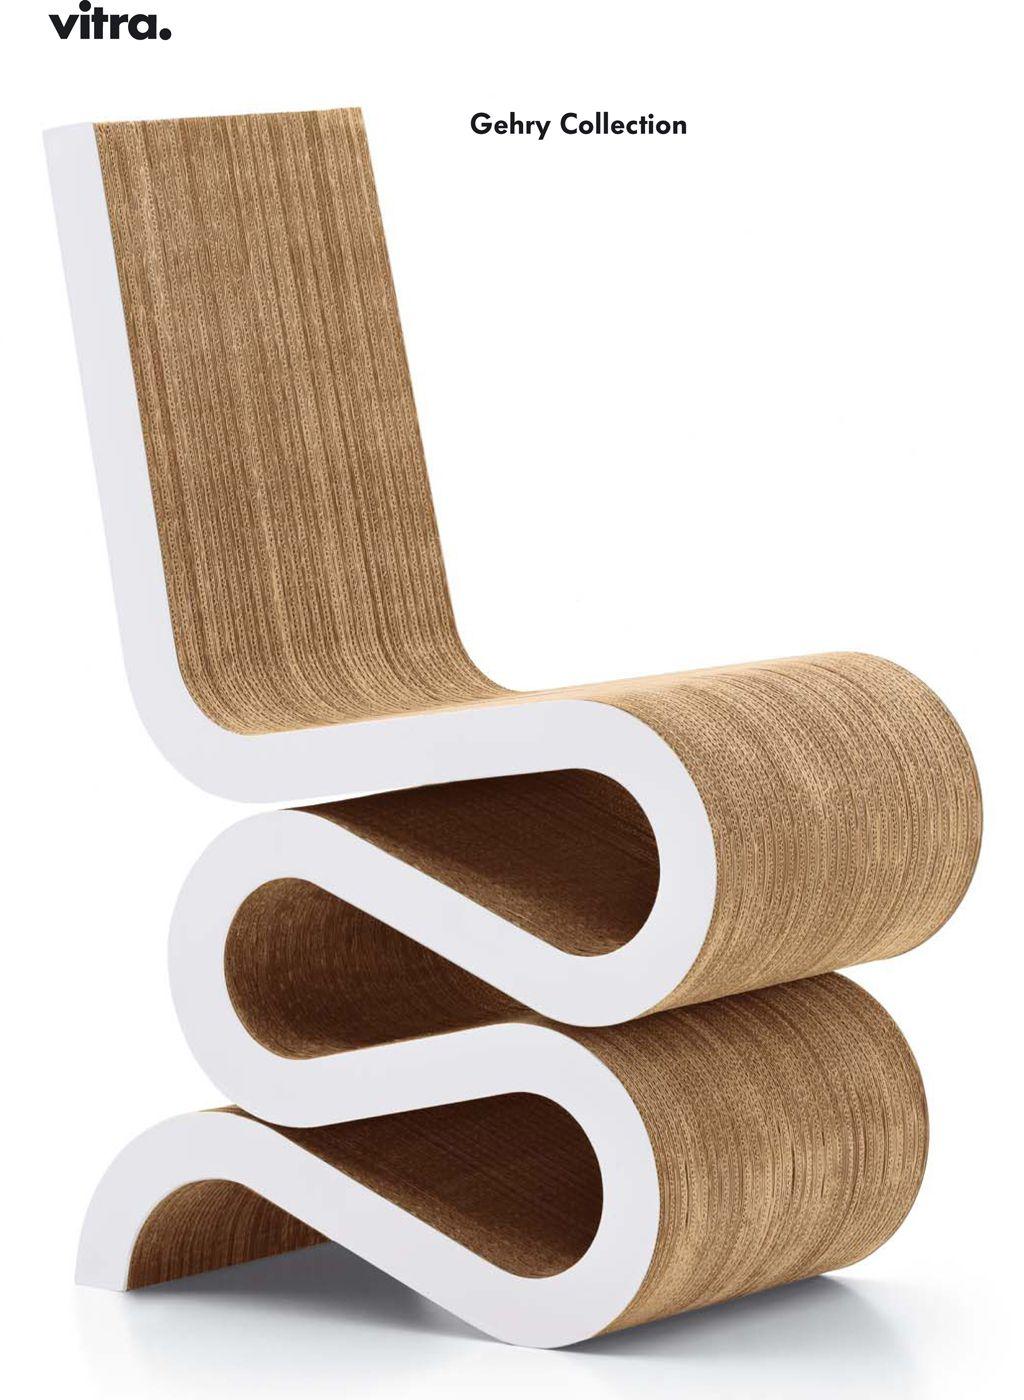 Mobiliario De Cart N Vol I Stgo # Muebles Nido De Abeja